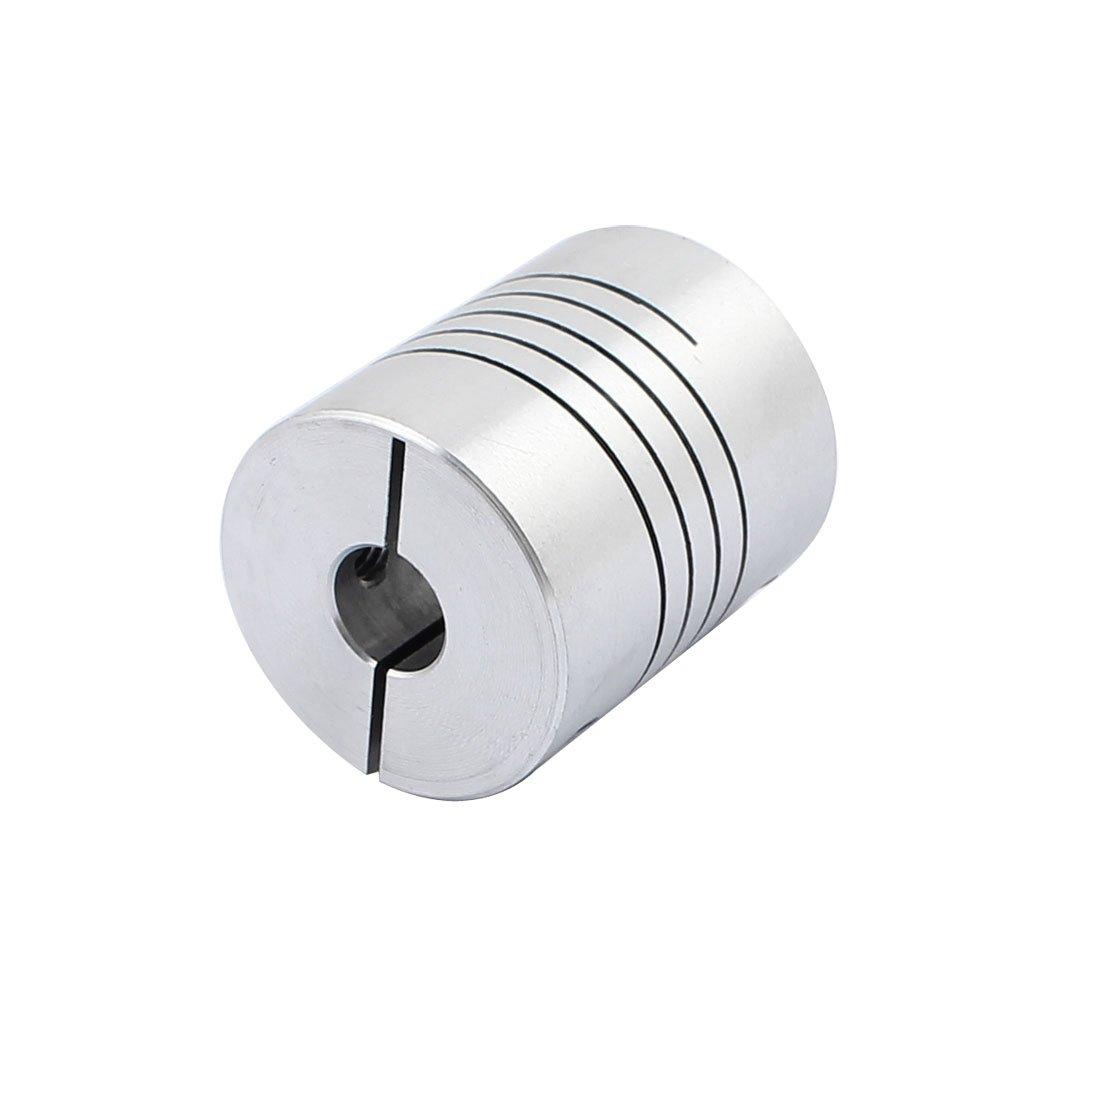 uxcell 6mm to 12mm Shaft Coupling 30mm Length 25mm Diameter Stepper Motor Coupler Aluminum Alloy Joint Connector for 3D Printer CNC Machine DIY Encoder